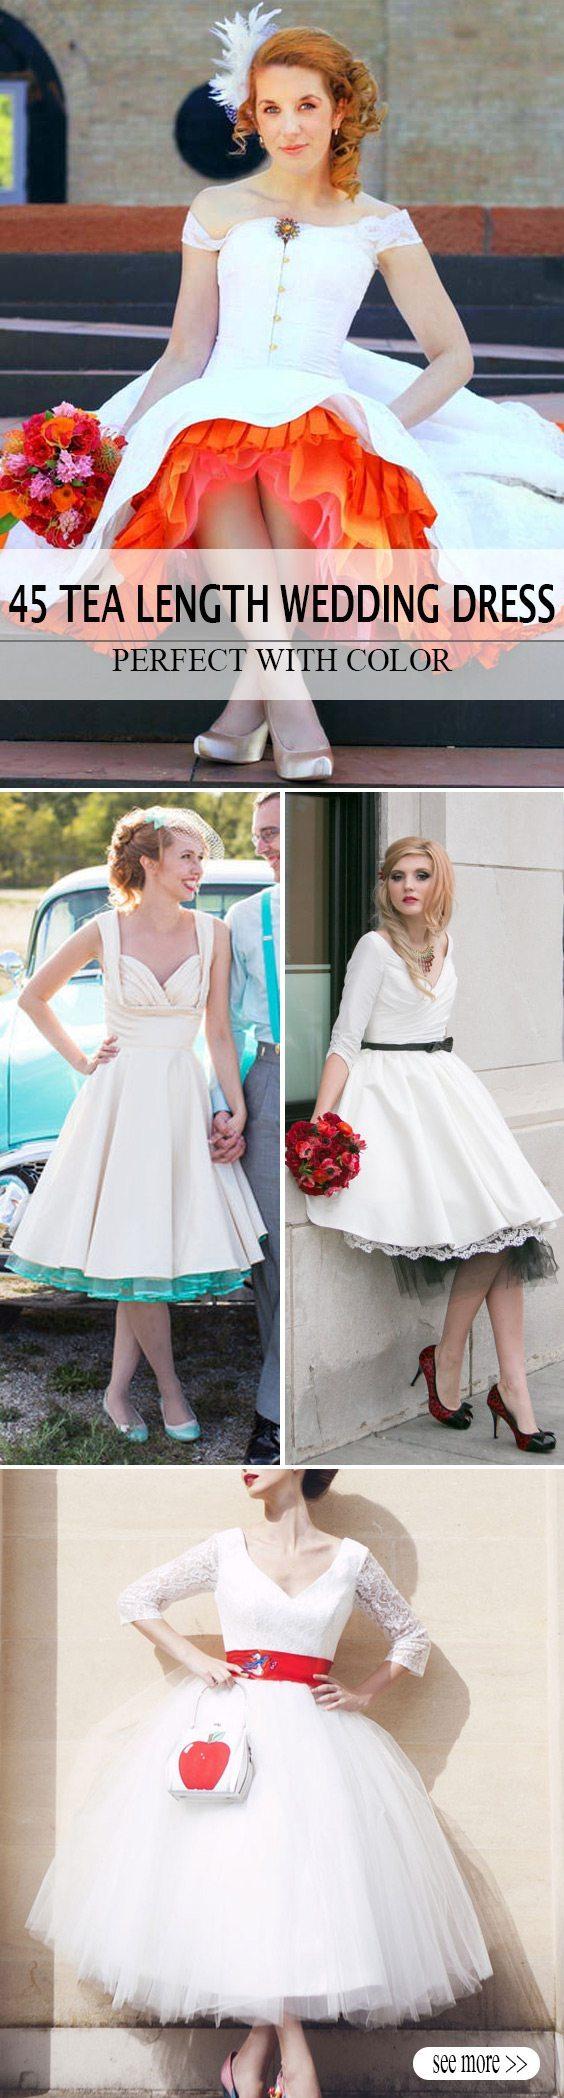 color tea length wedding dress